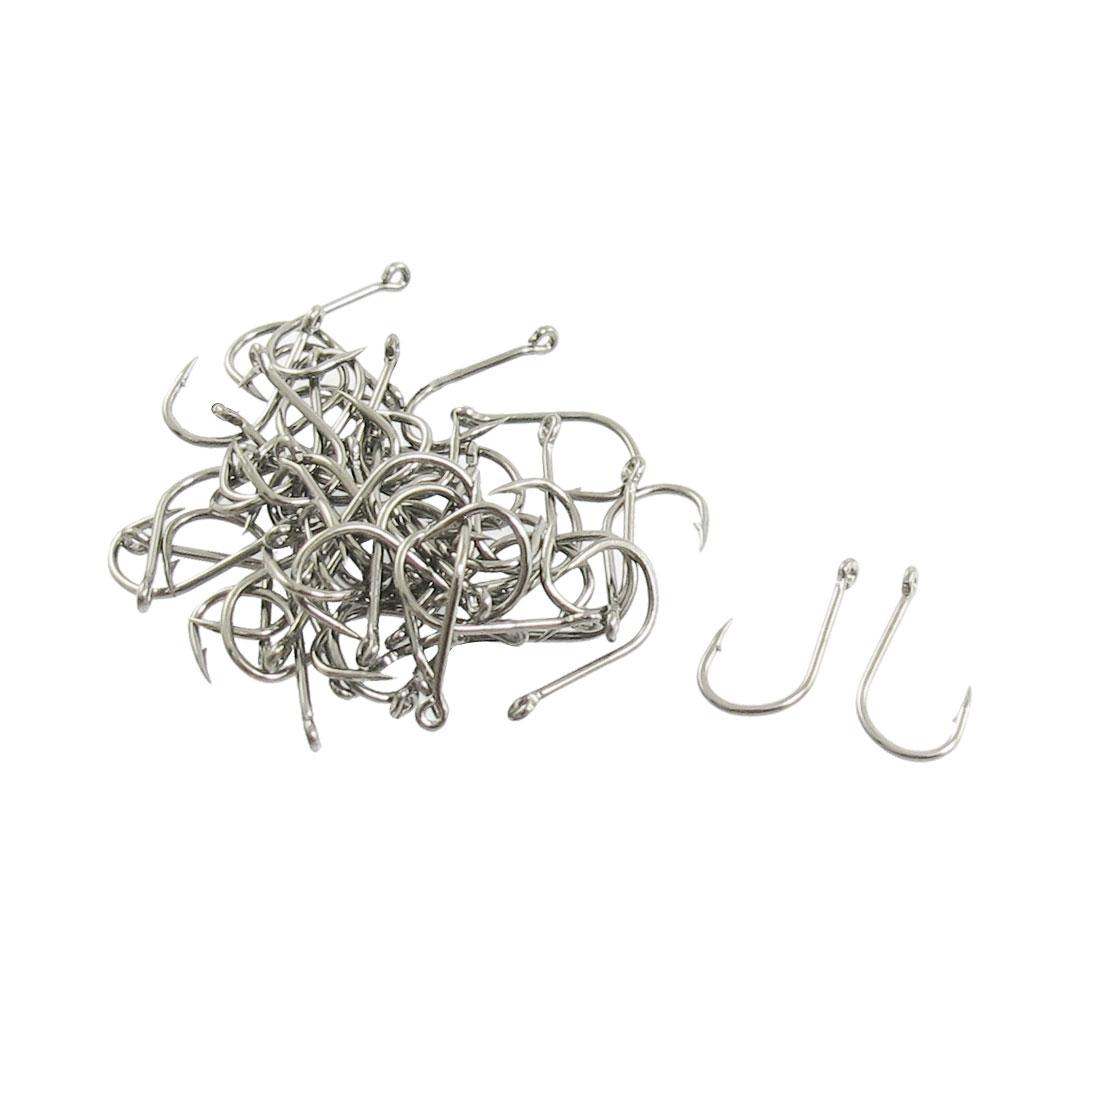 45 Pcs Silver Tone Metal Eyeless Barbed Fishhook Fishing Tool 3#